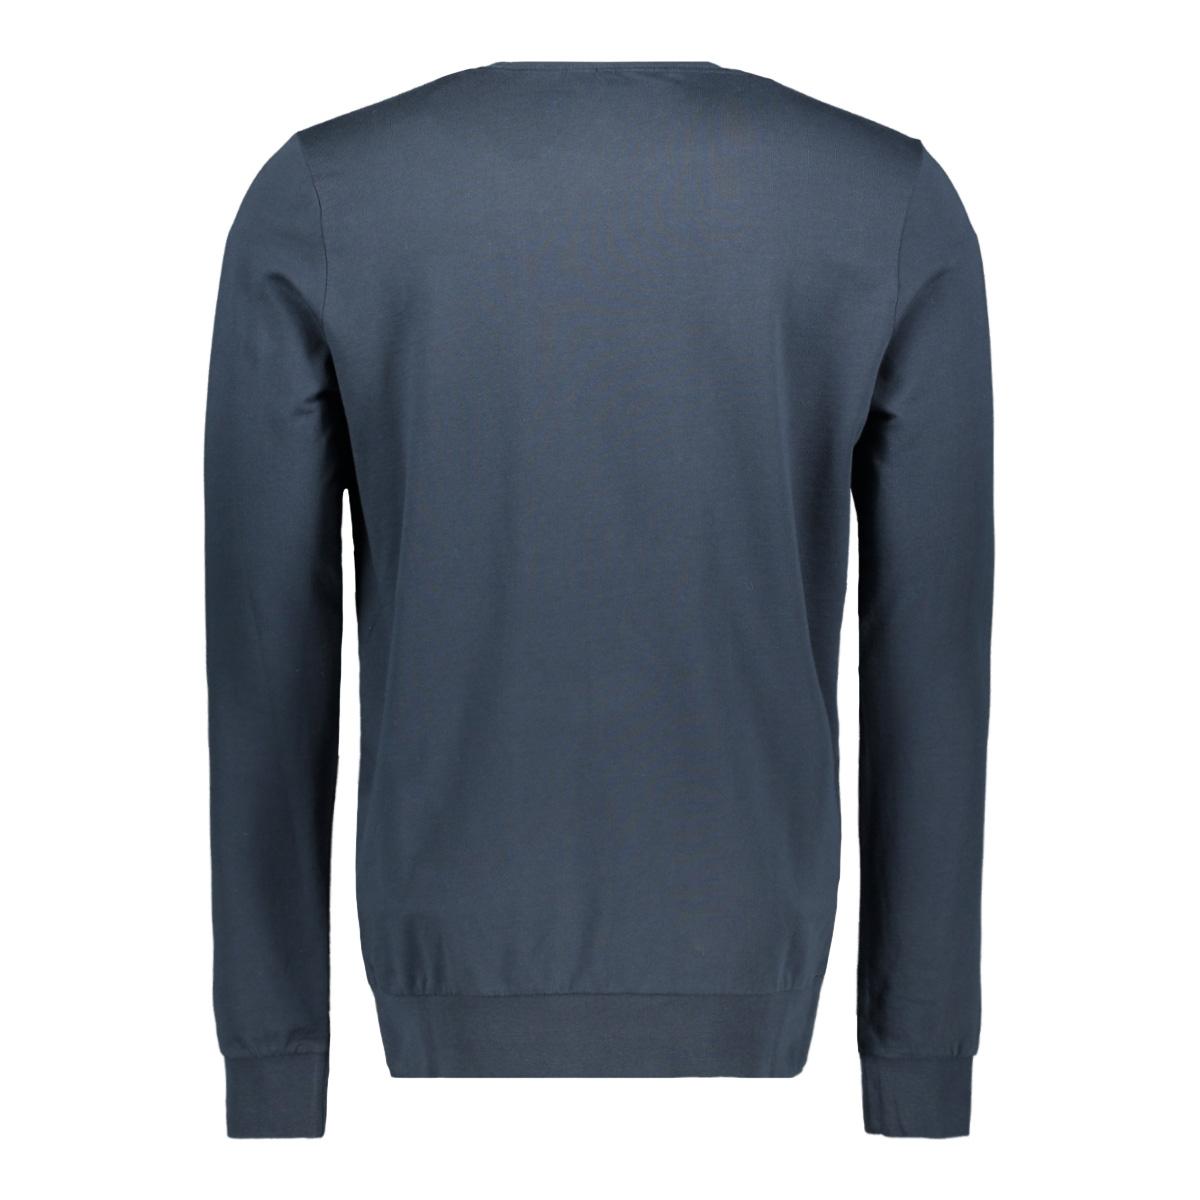 long sleeve t shirt pts196538 pme legend t-shirt 5281